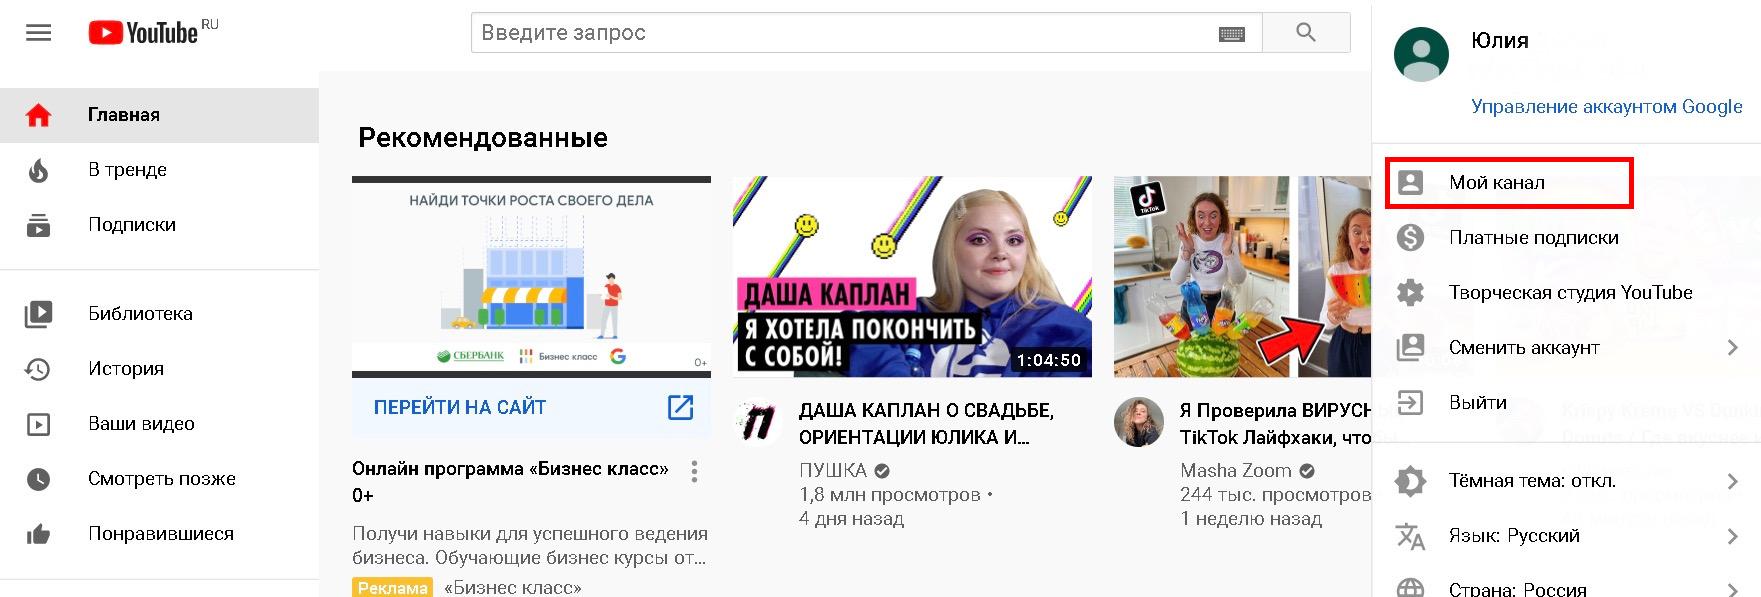 Нажимаем «Мой канал»